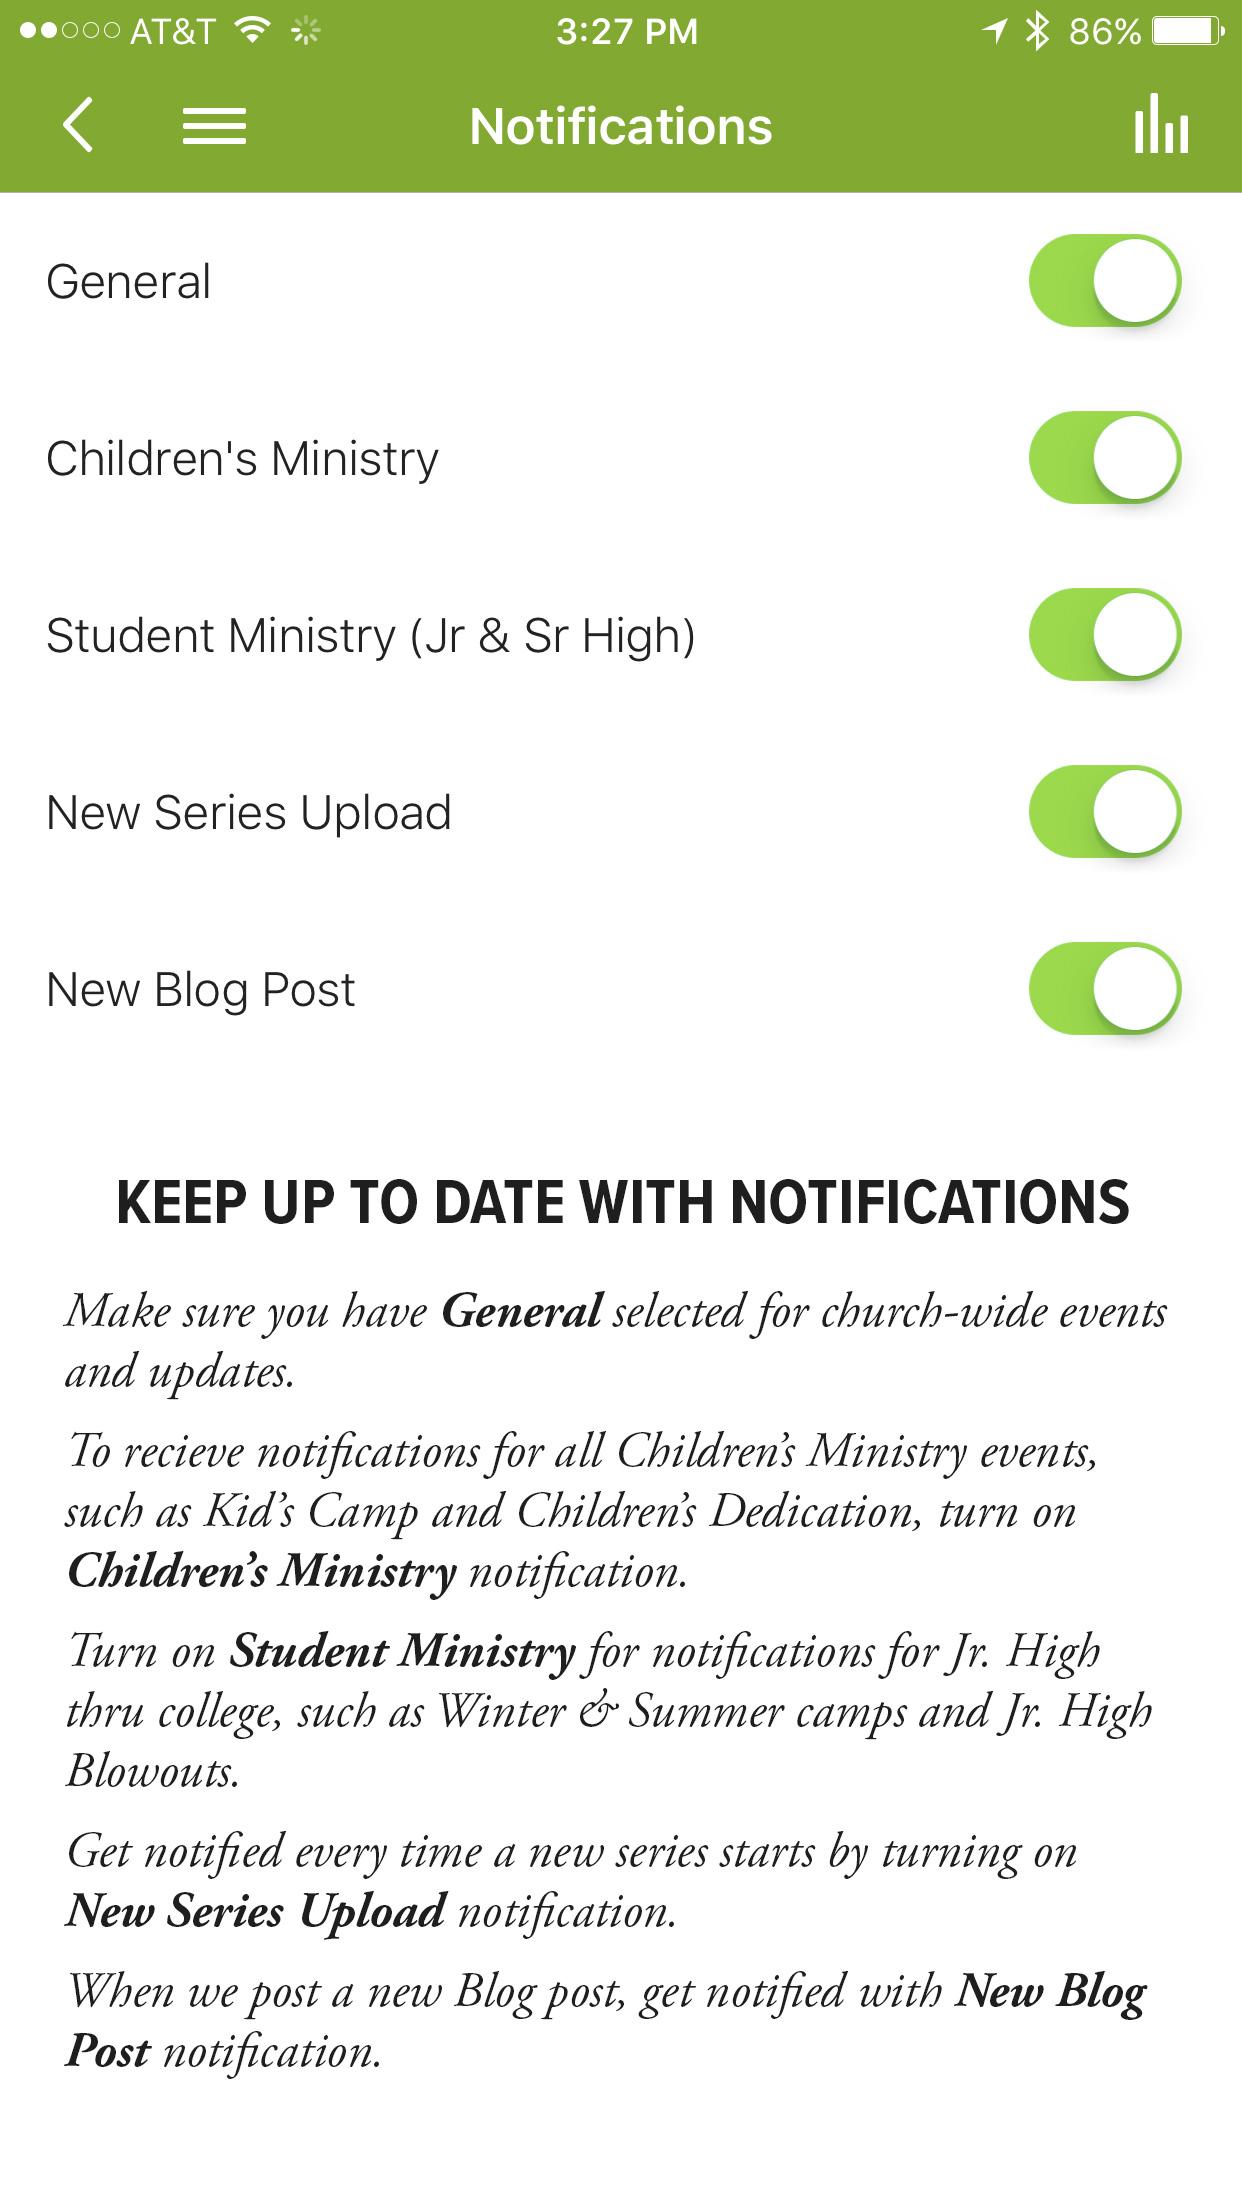 3. Customize you Notifications